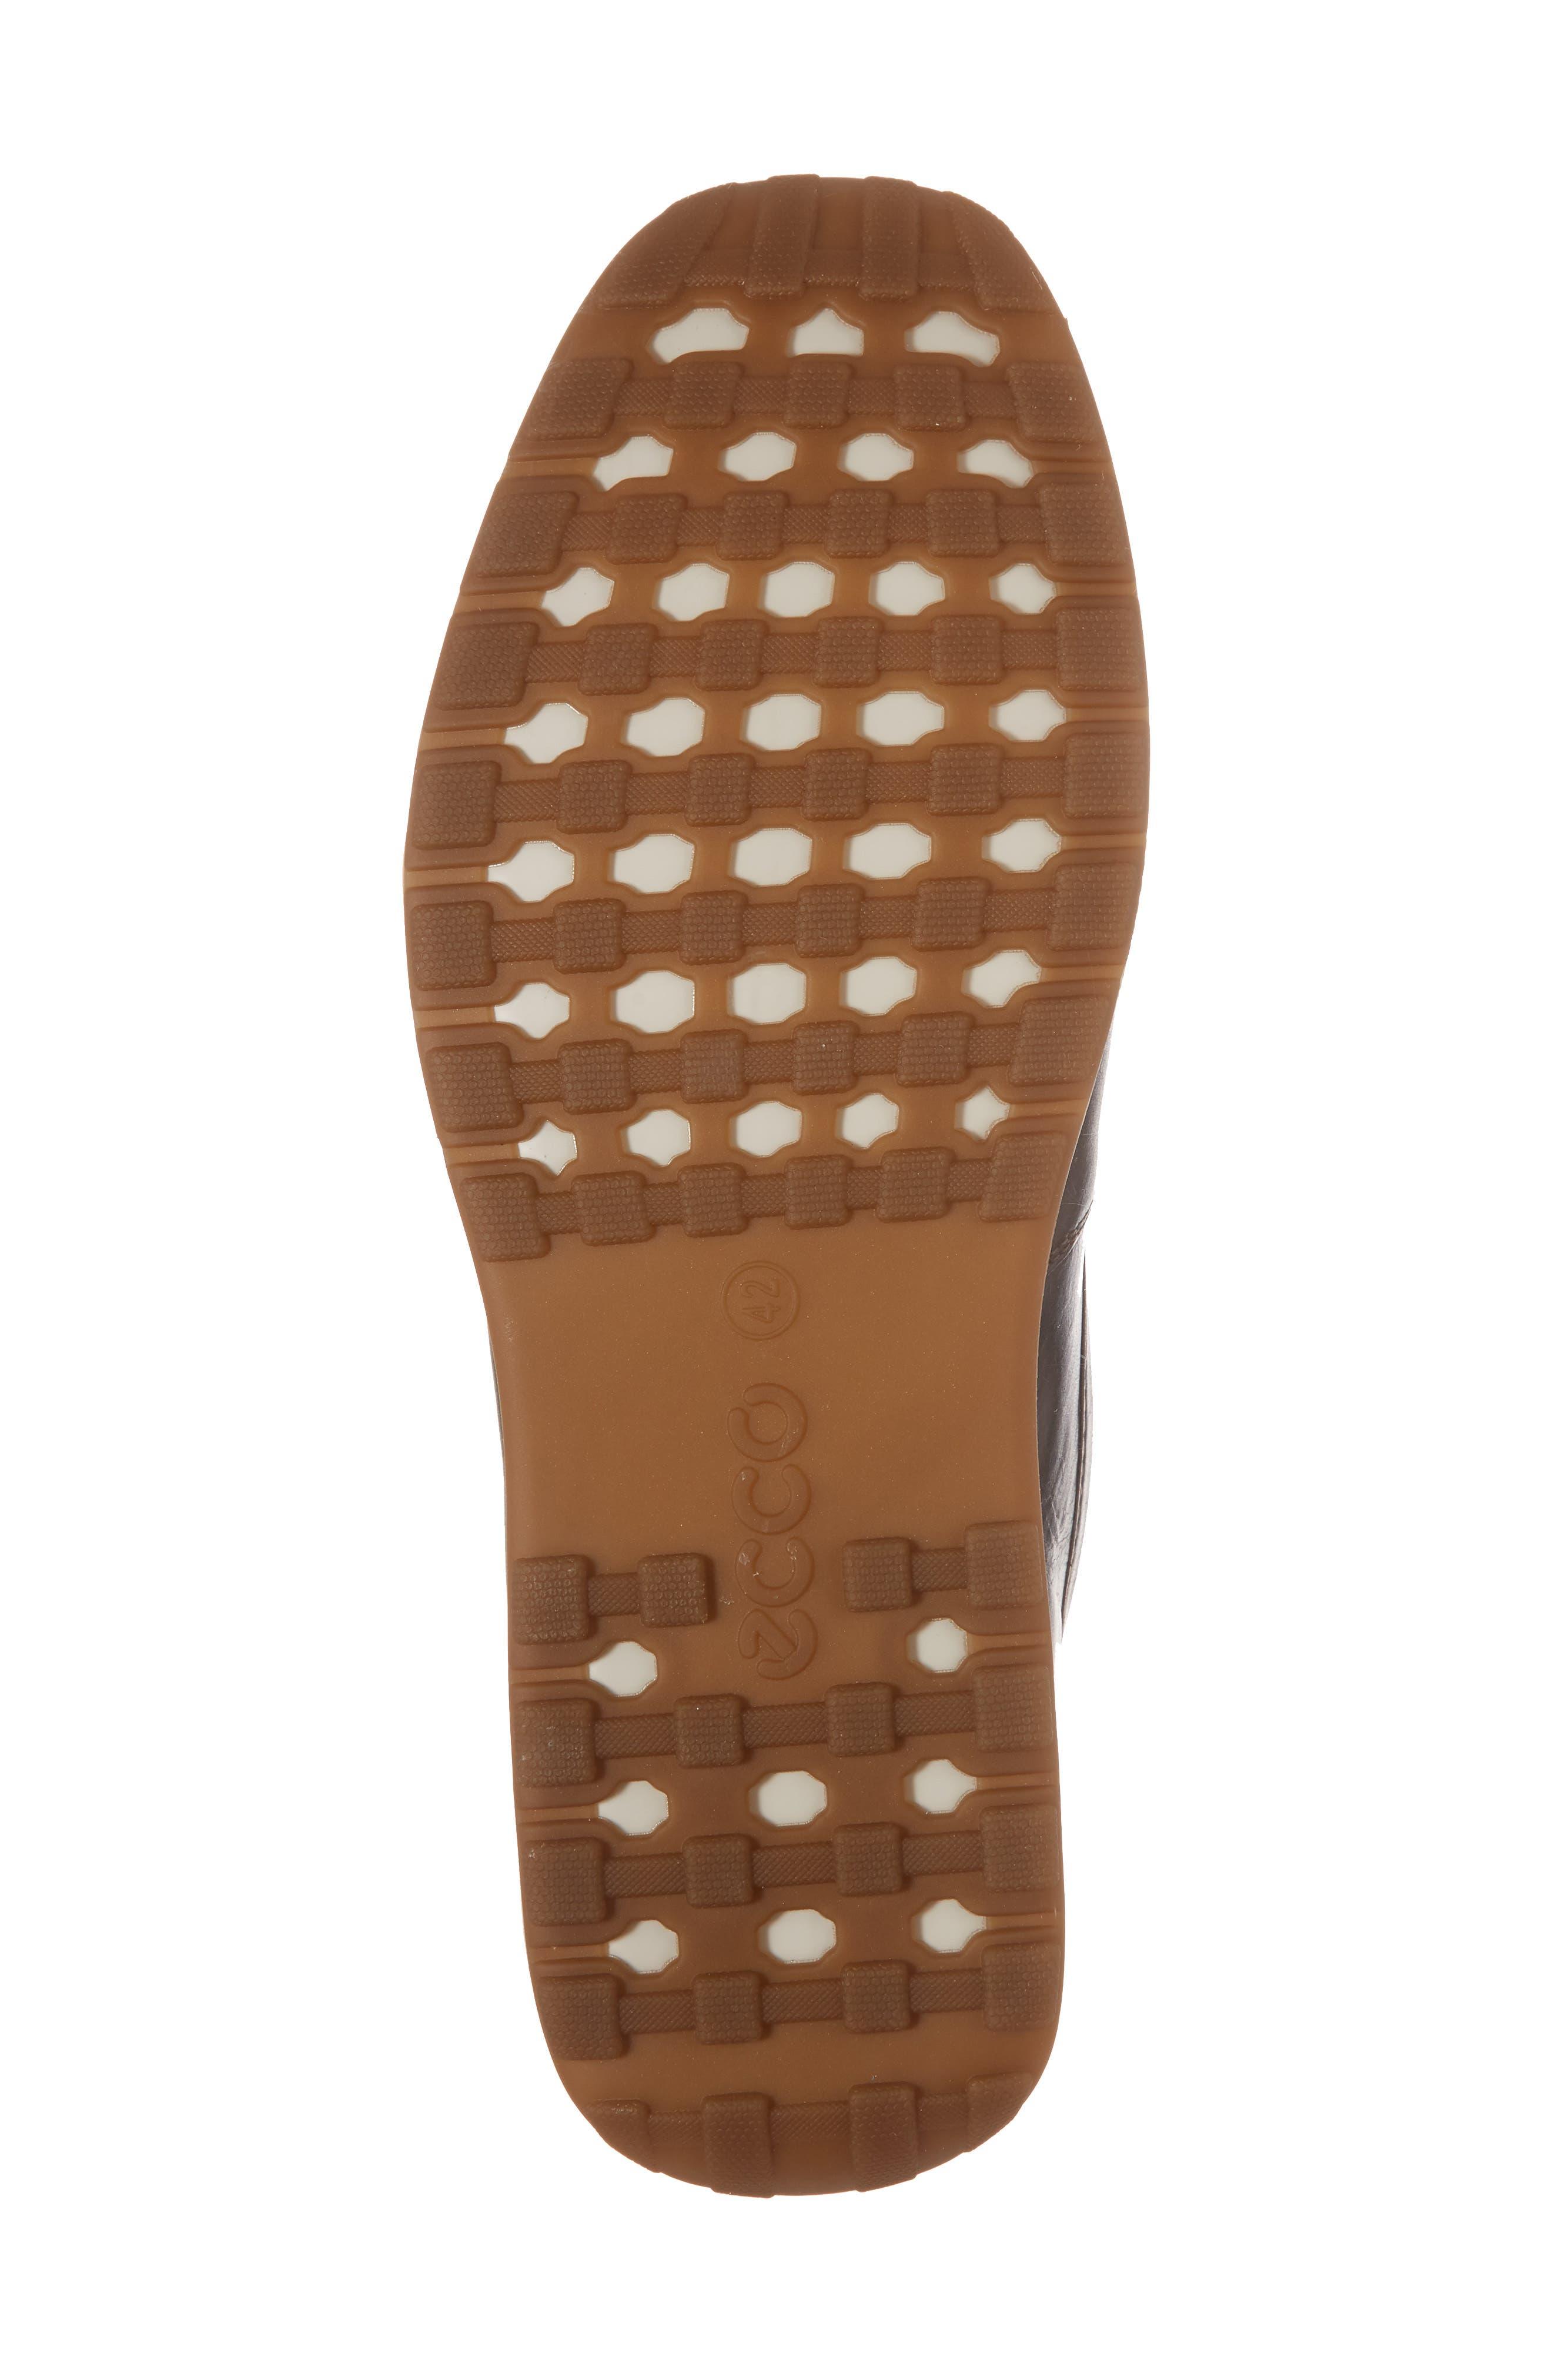 Dip Moc Toe Driving Loafer,                             Alternate thumbnail 6, color,                             Mocha Leather